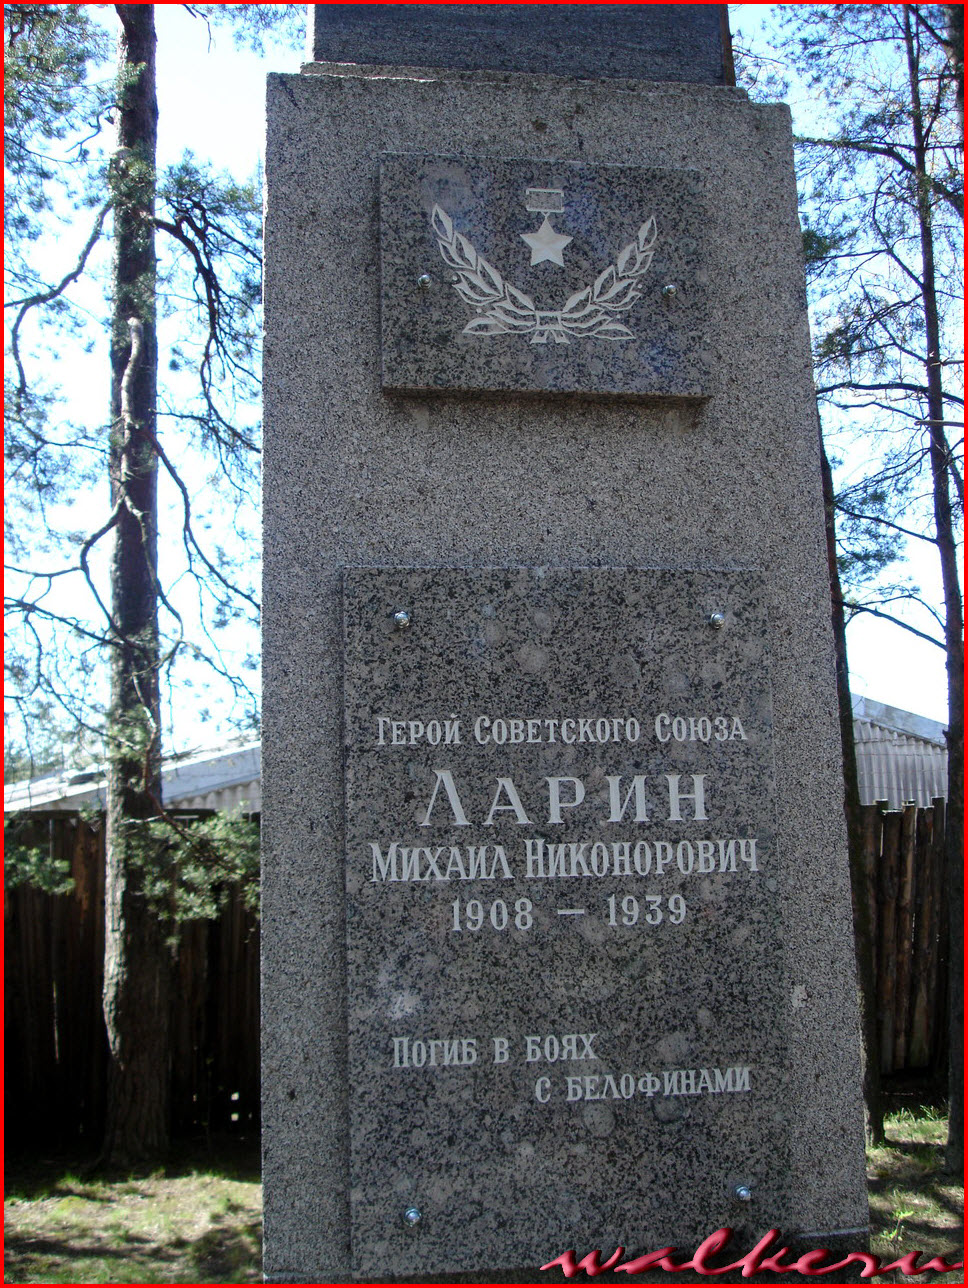 Могила Ларина М.Н. в Сертолово